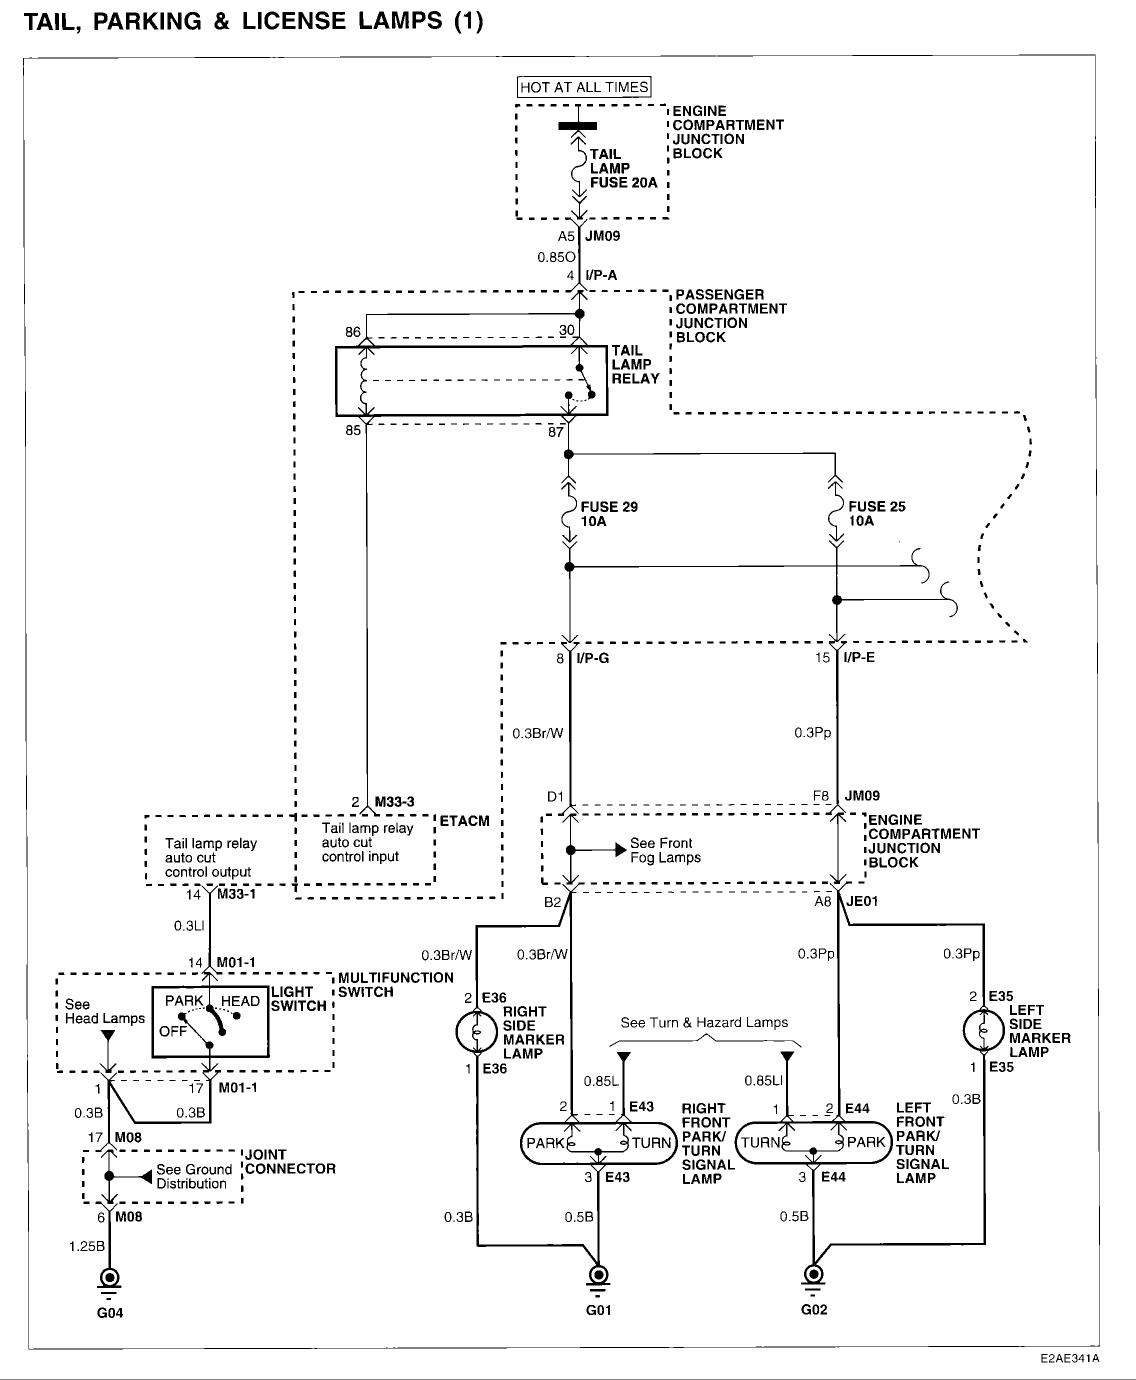 hyundai accent radio wiring diagram Collection-2009 Hyundai sonata Fuse Box Diagram Inspirational sophisticated Hyundai sonata Wiring Diagram Image 8-n